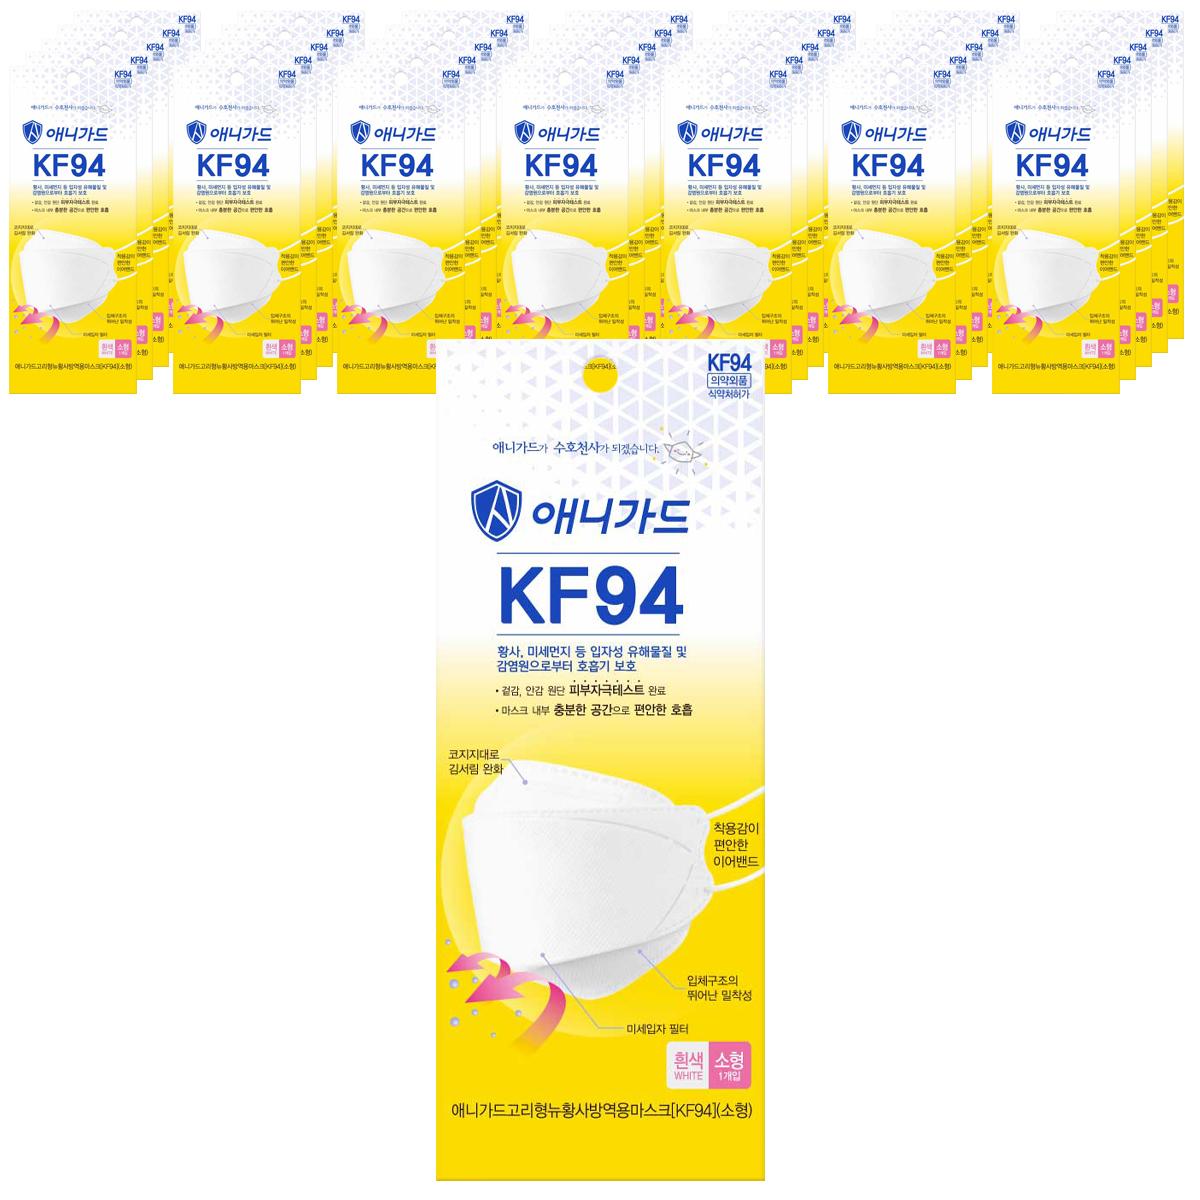 kf94소형